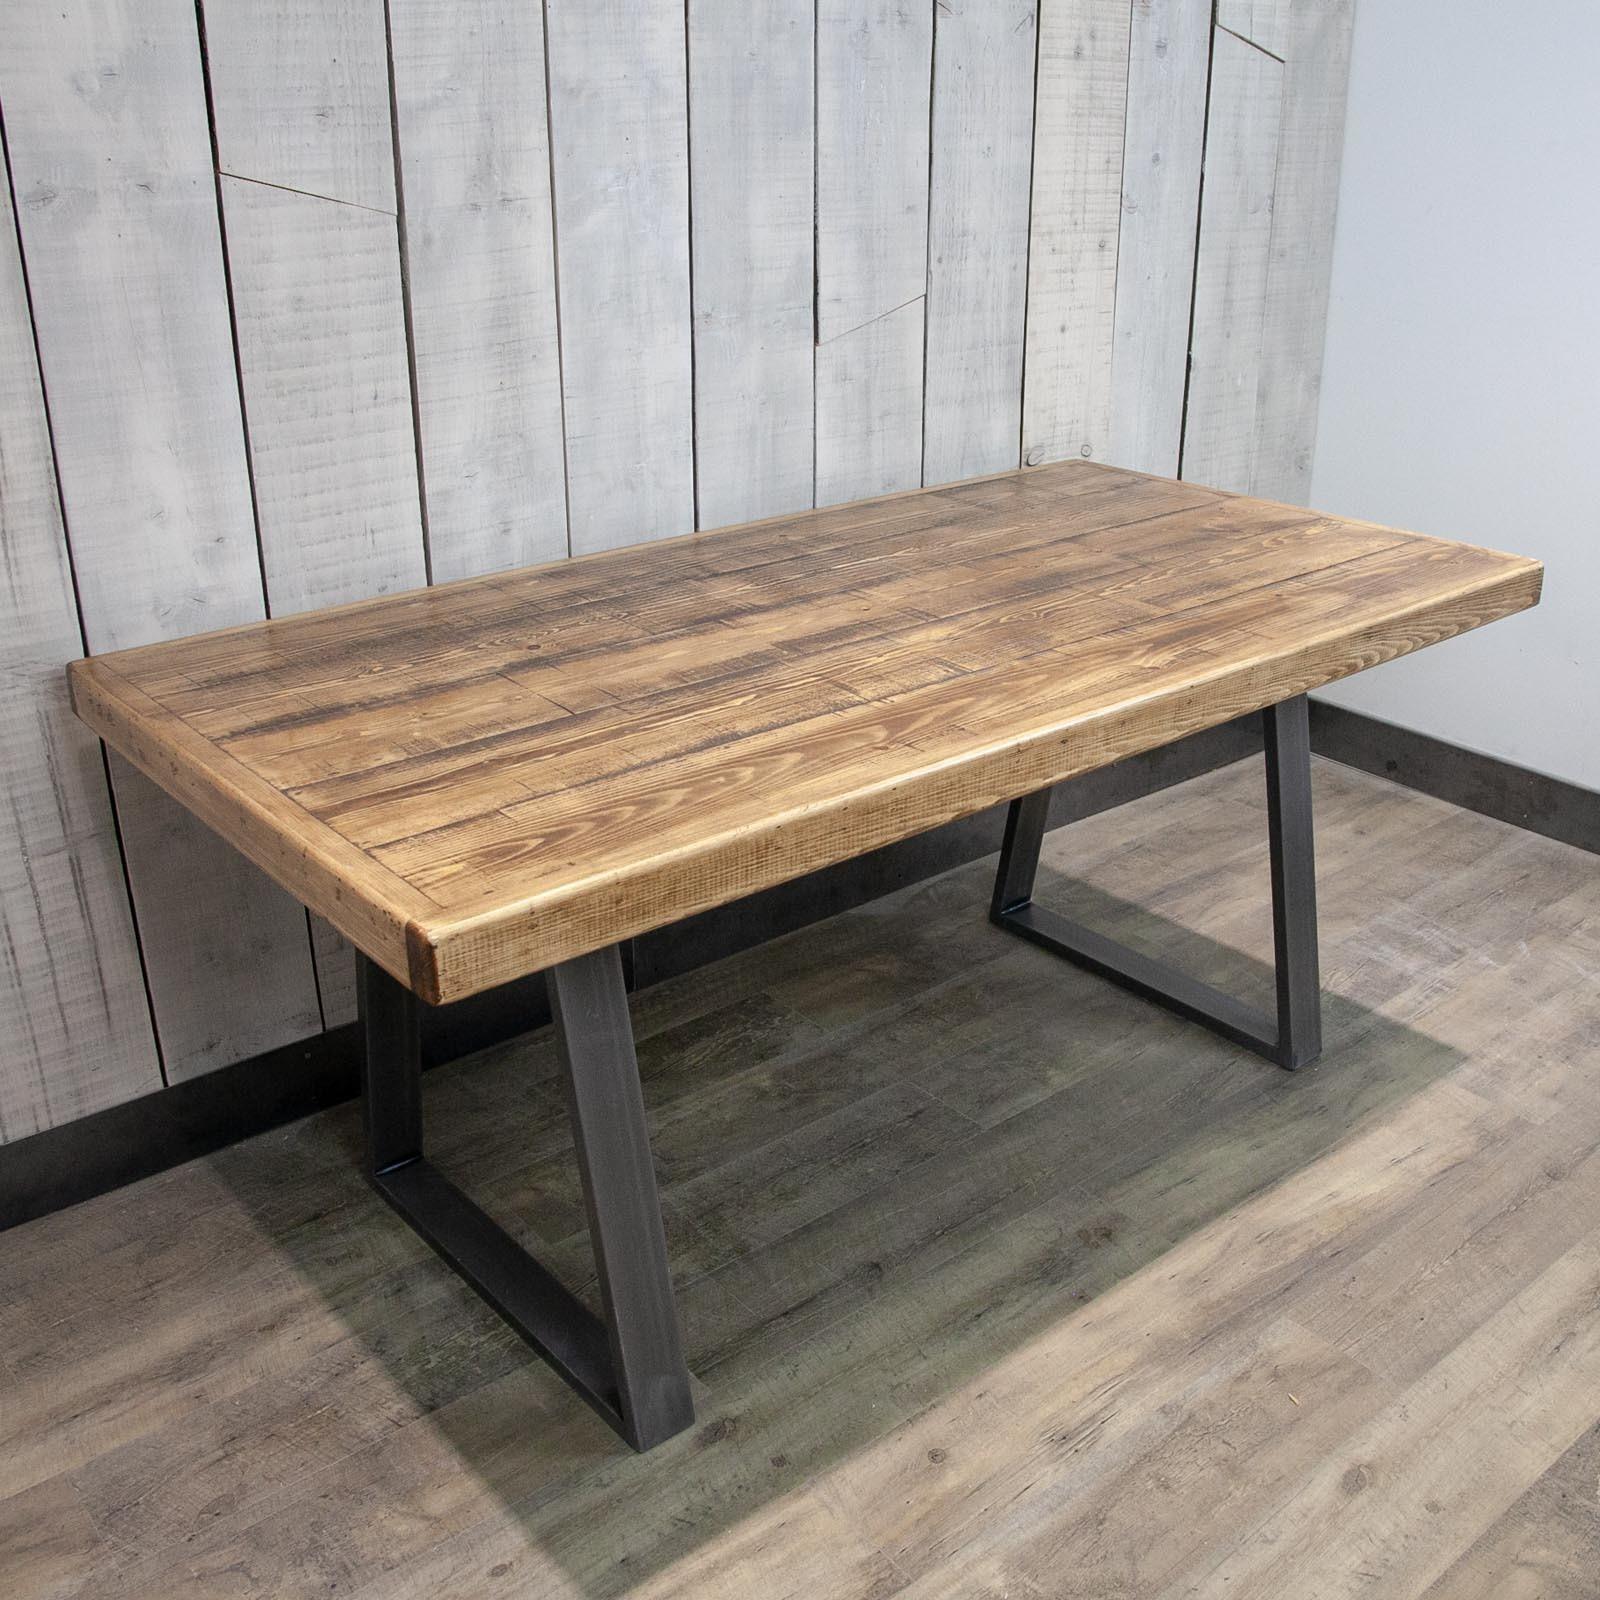 Trapezium Leg Dining Table 160x85cm Patina Patina Vinterior